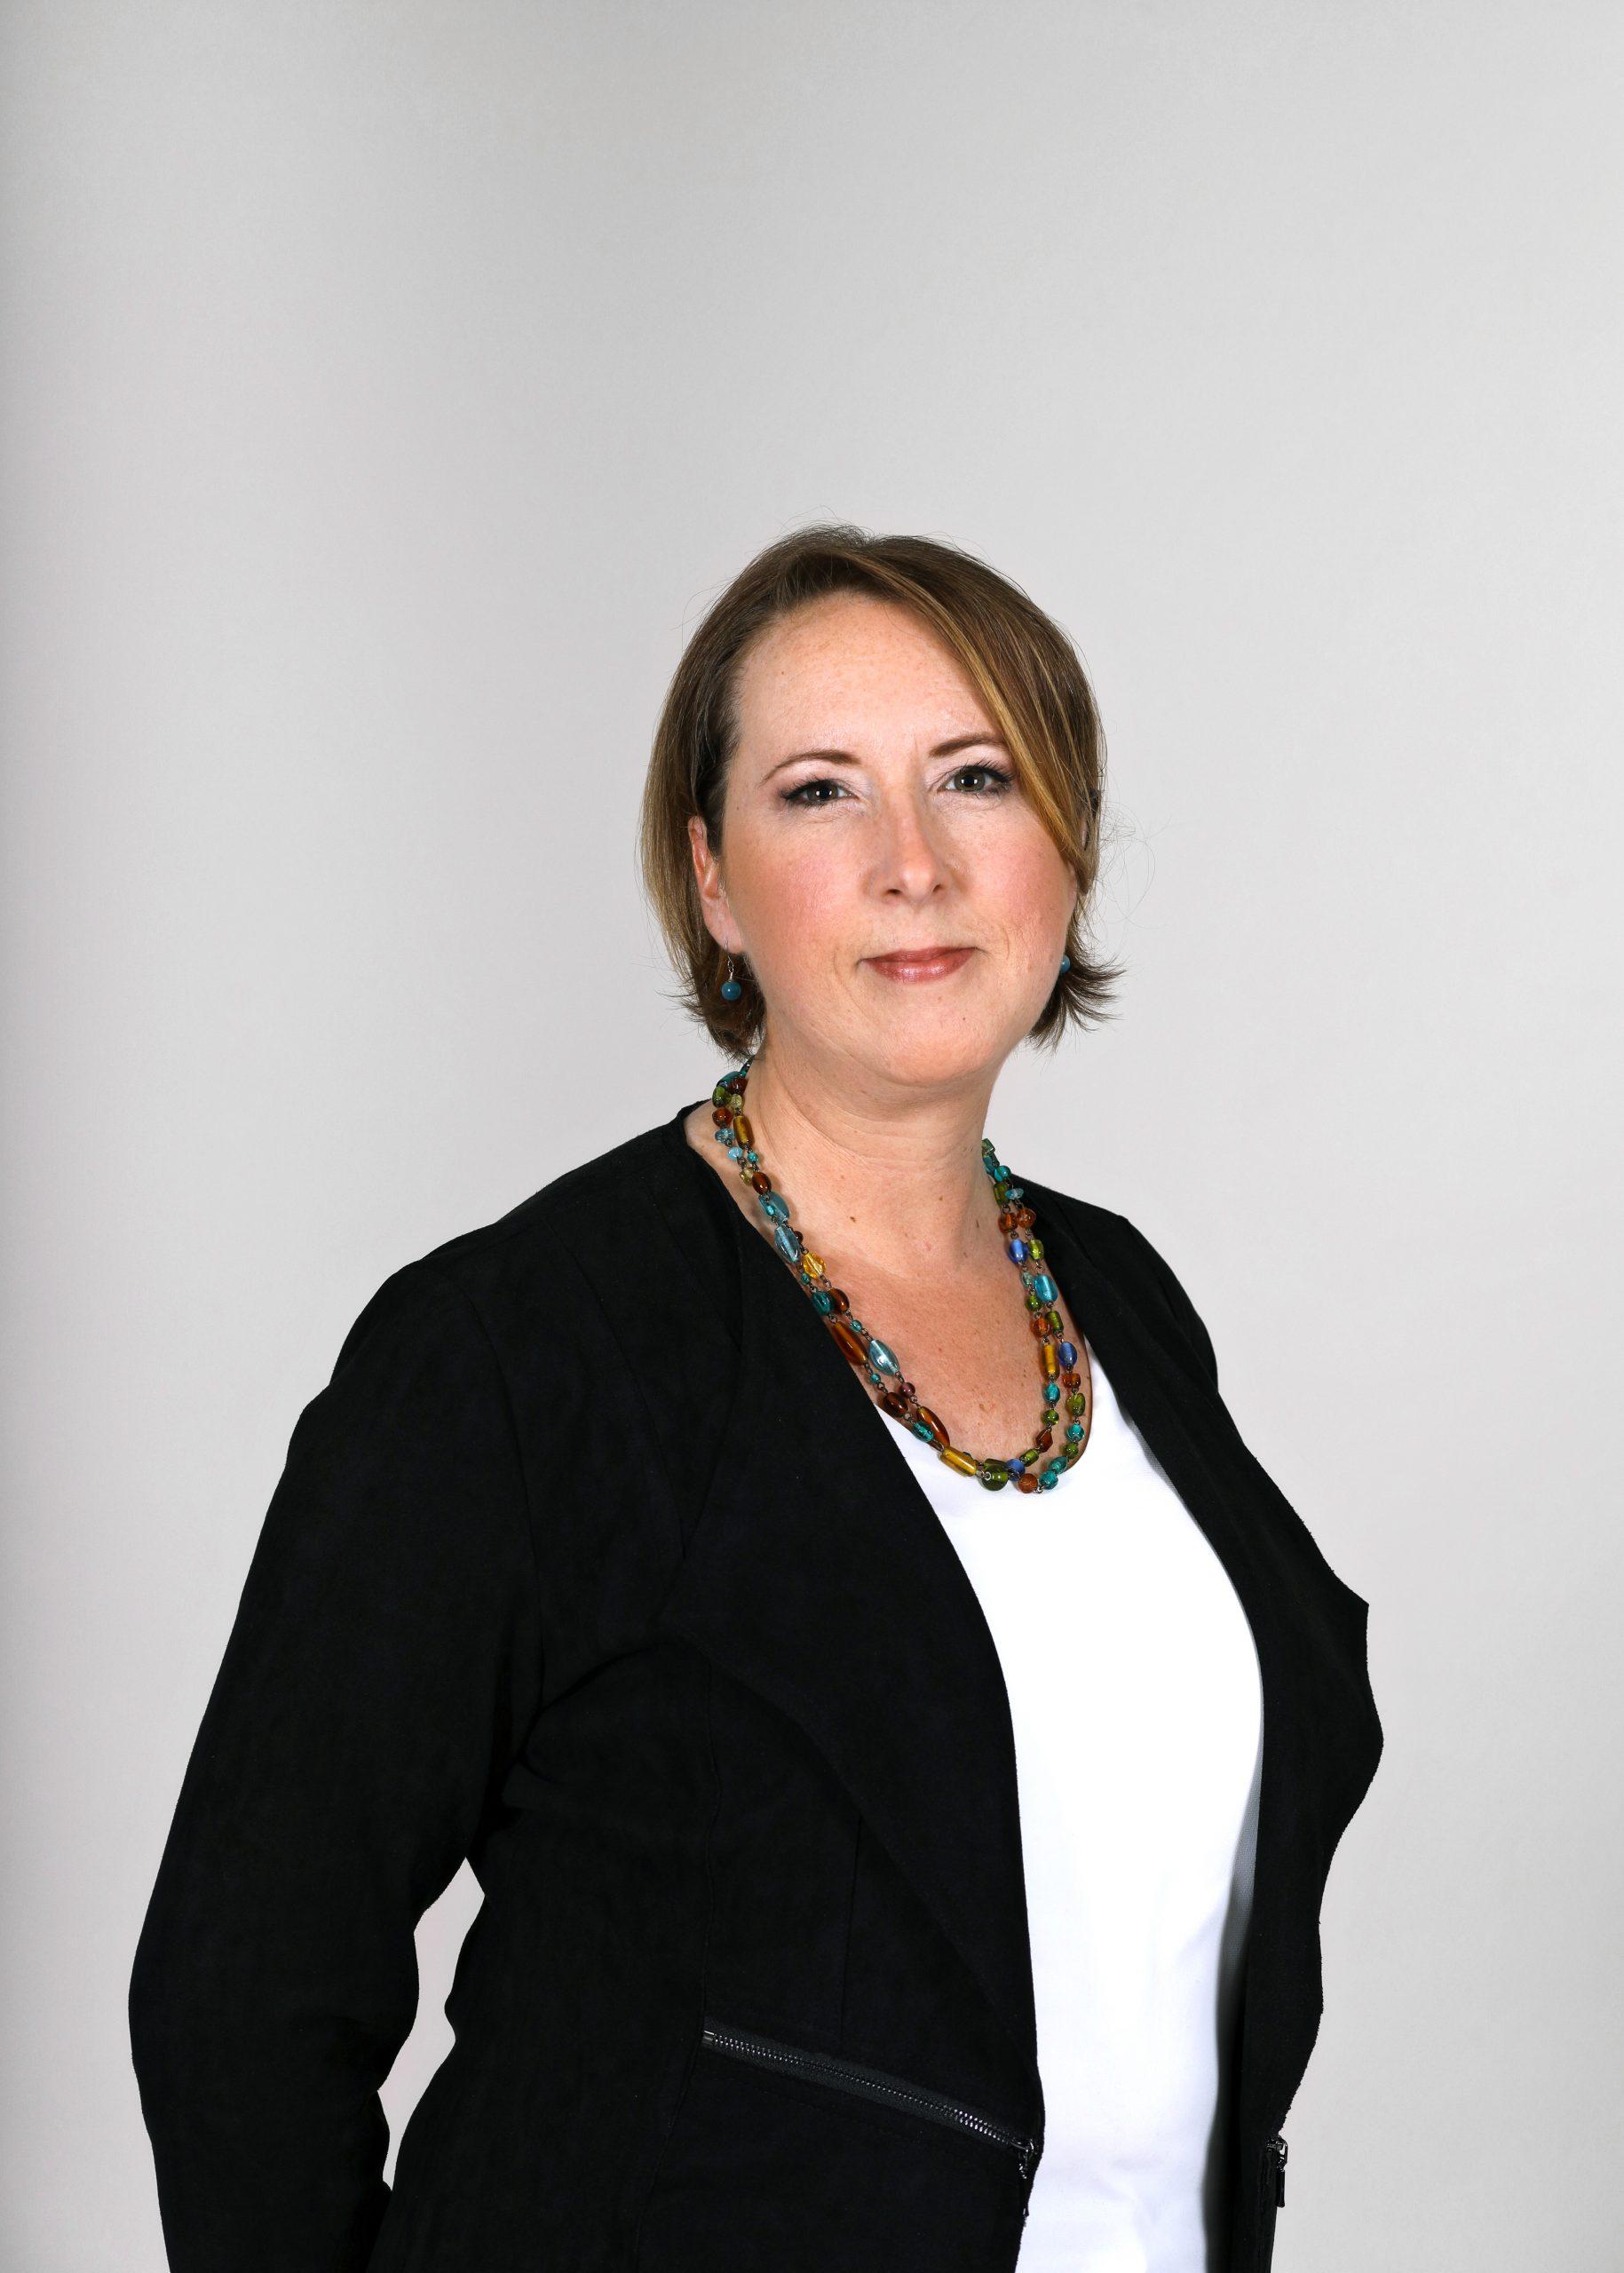 Dr. Rebecca Neuburger-Hees